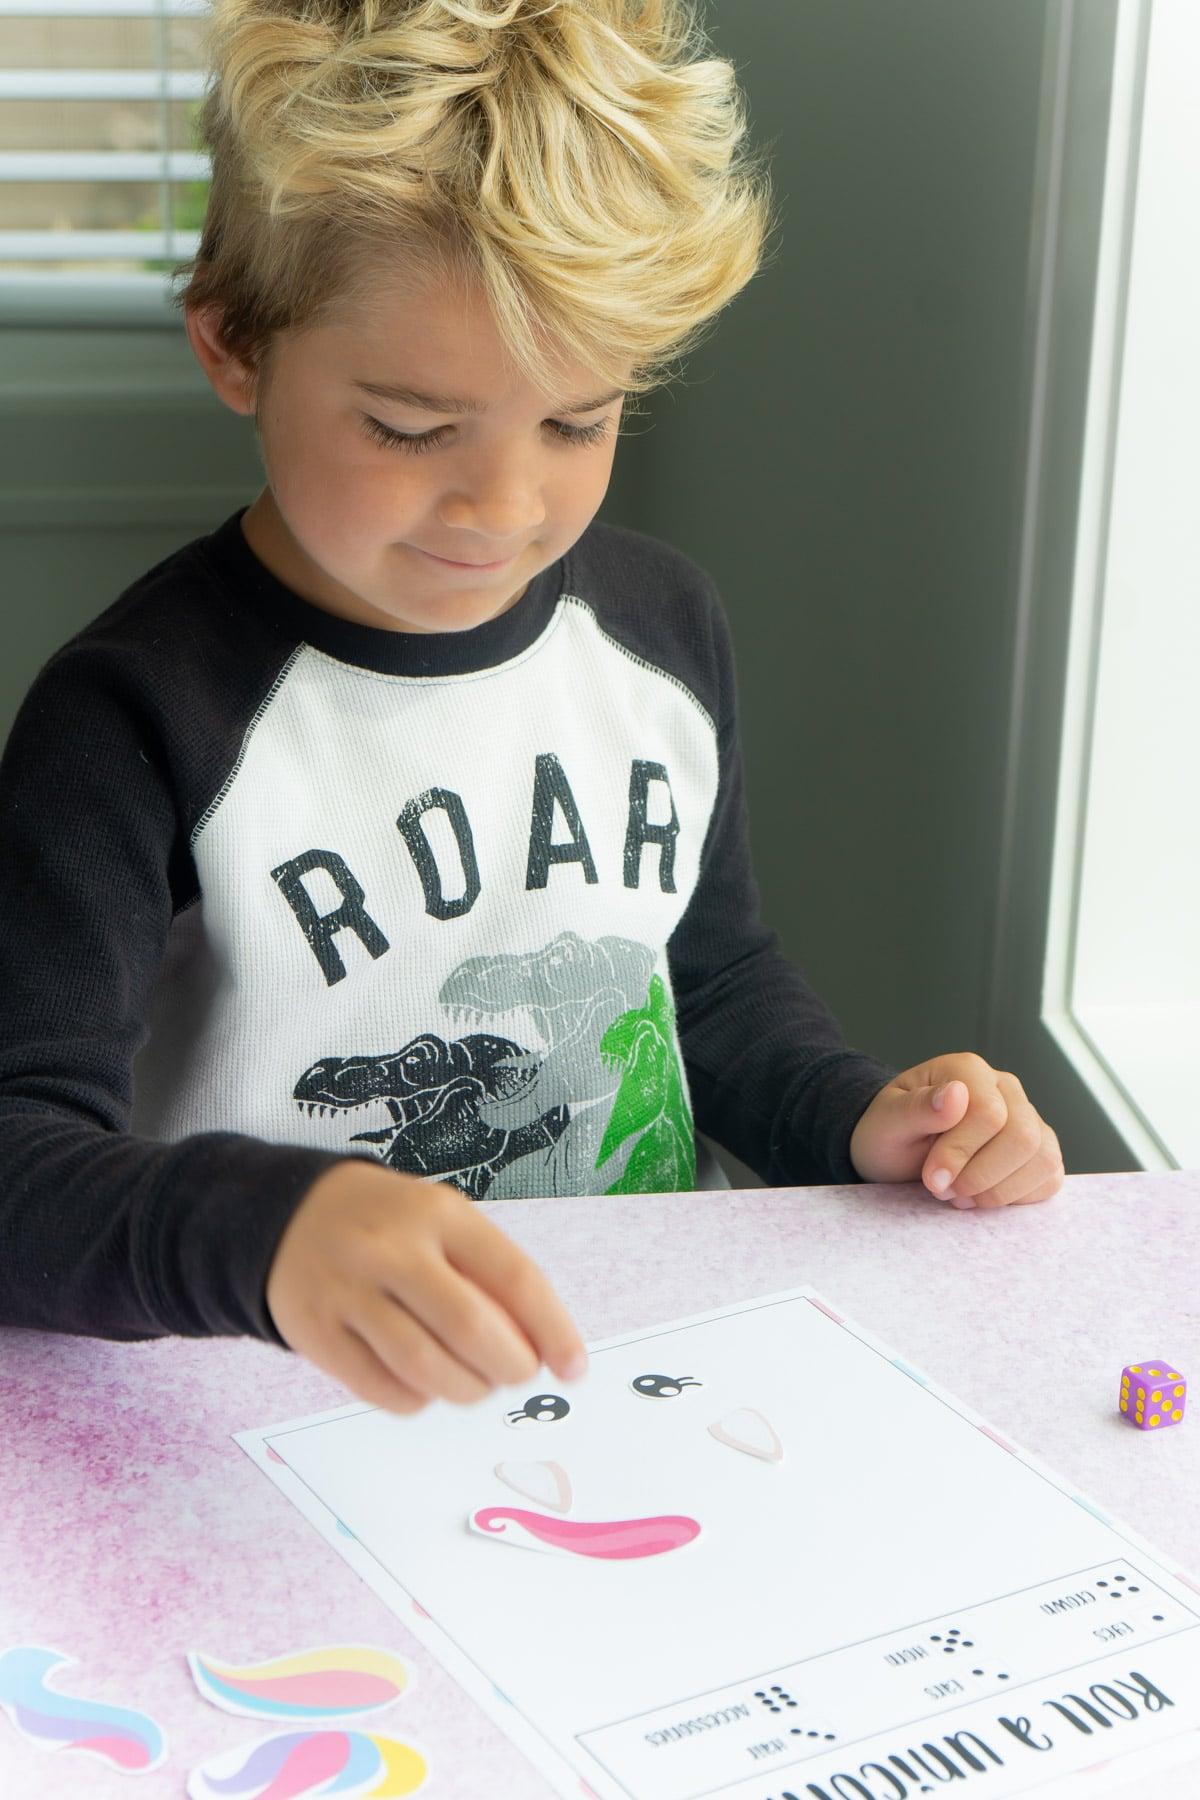 Boy playing roll a unicorn game